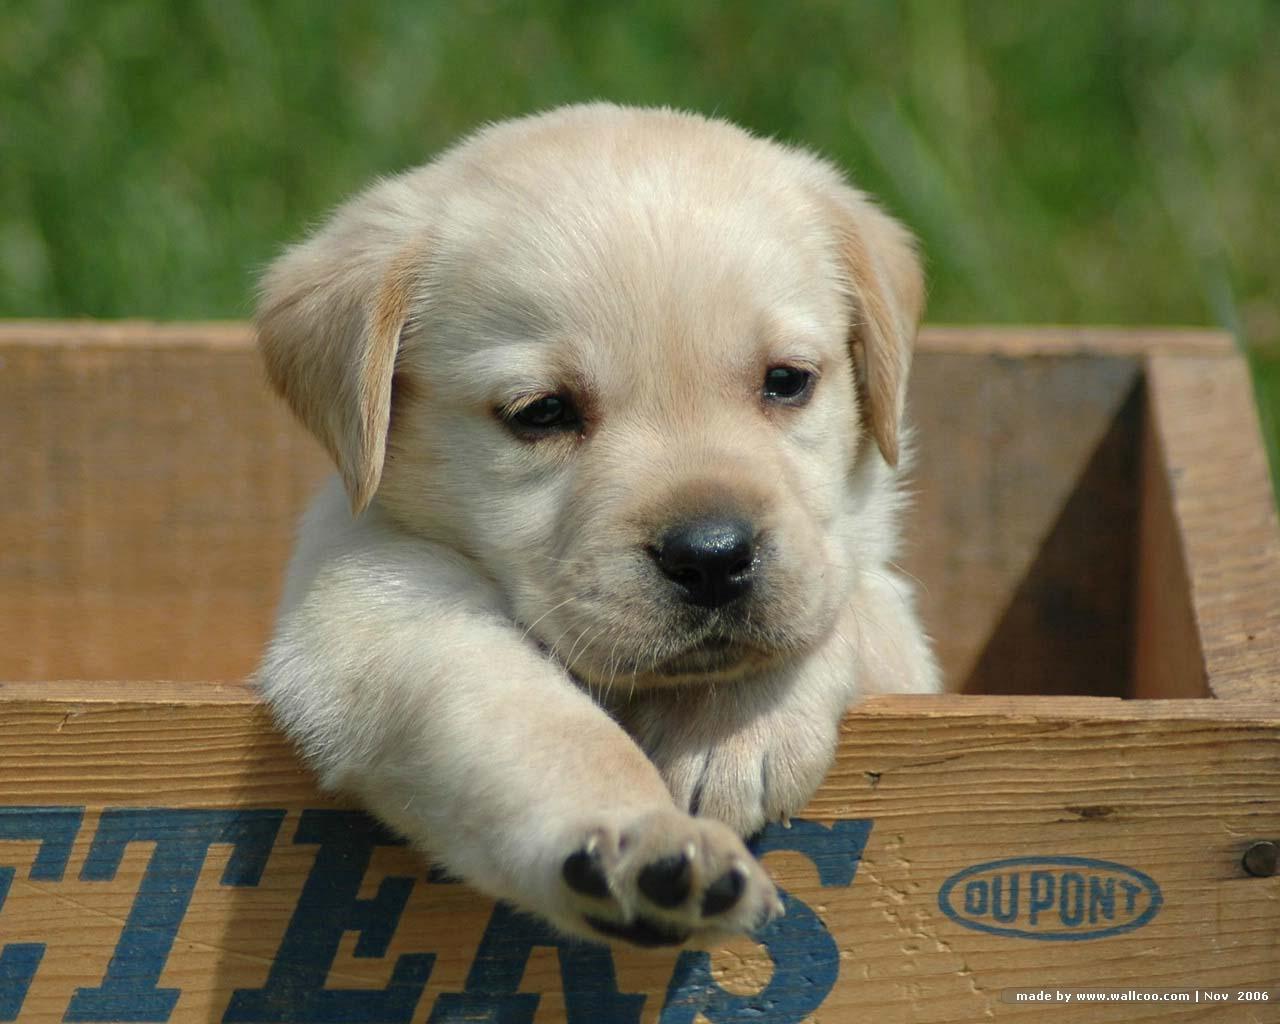 http://2.bp.blogspot.com/_Eq0z9sFgDsQ/TCy8D_m8-SI/AAAAAAAAAKs/AeyJYVI1KTI/s1600/labrador_retriever_puppy_2.jpg